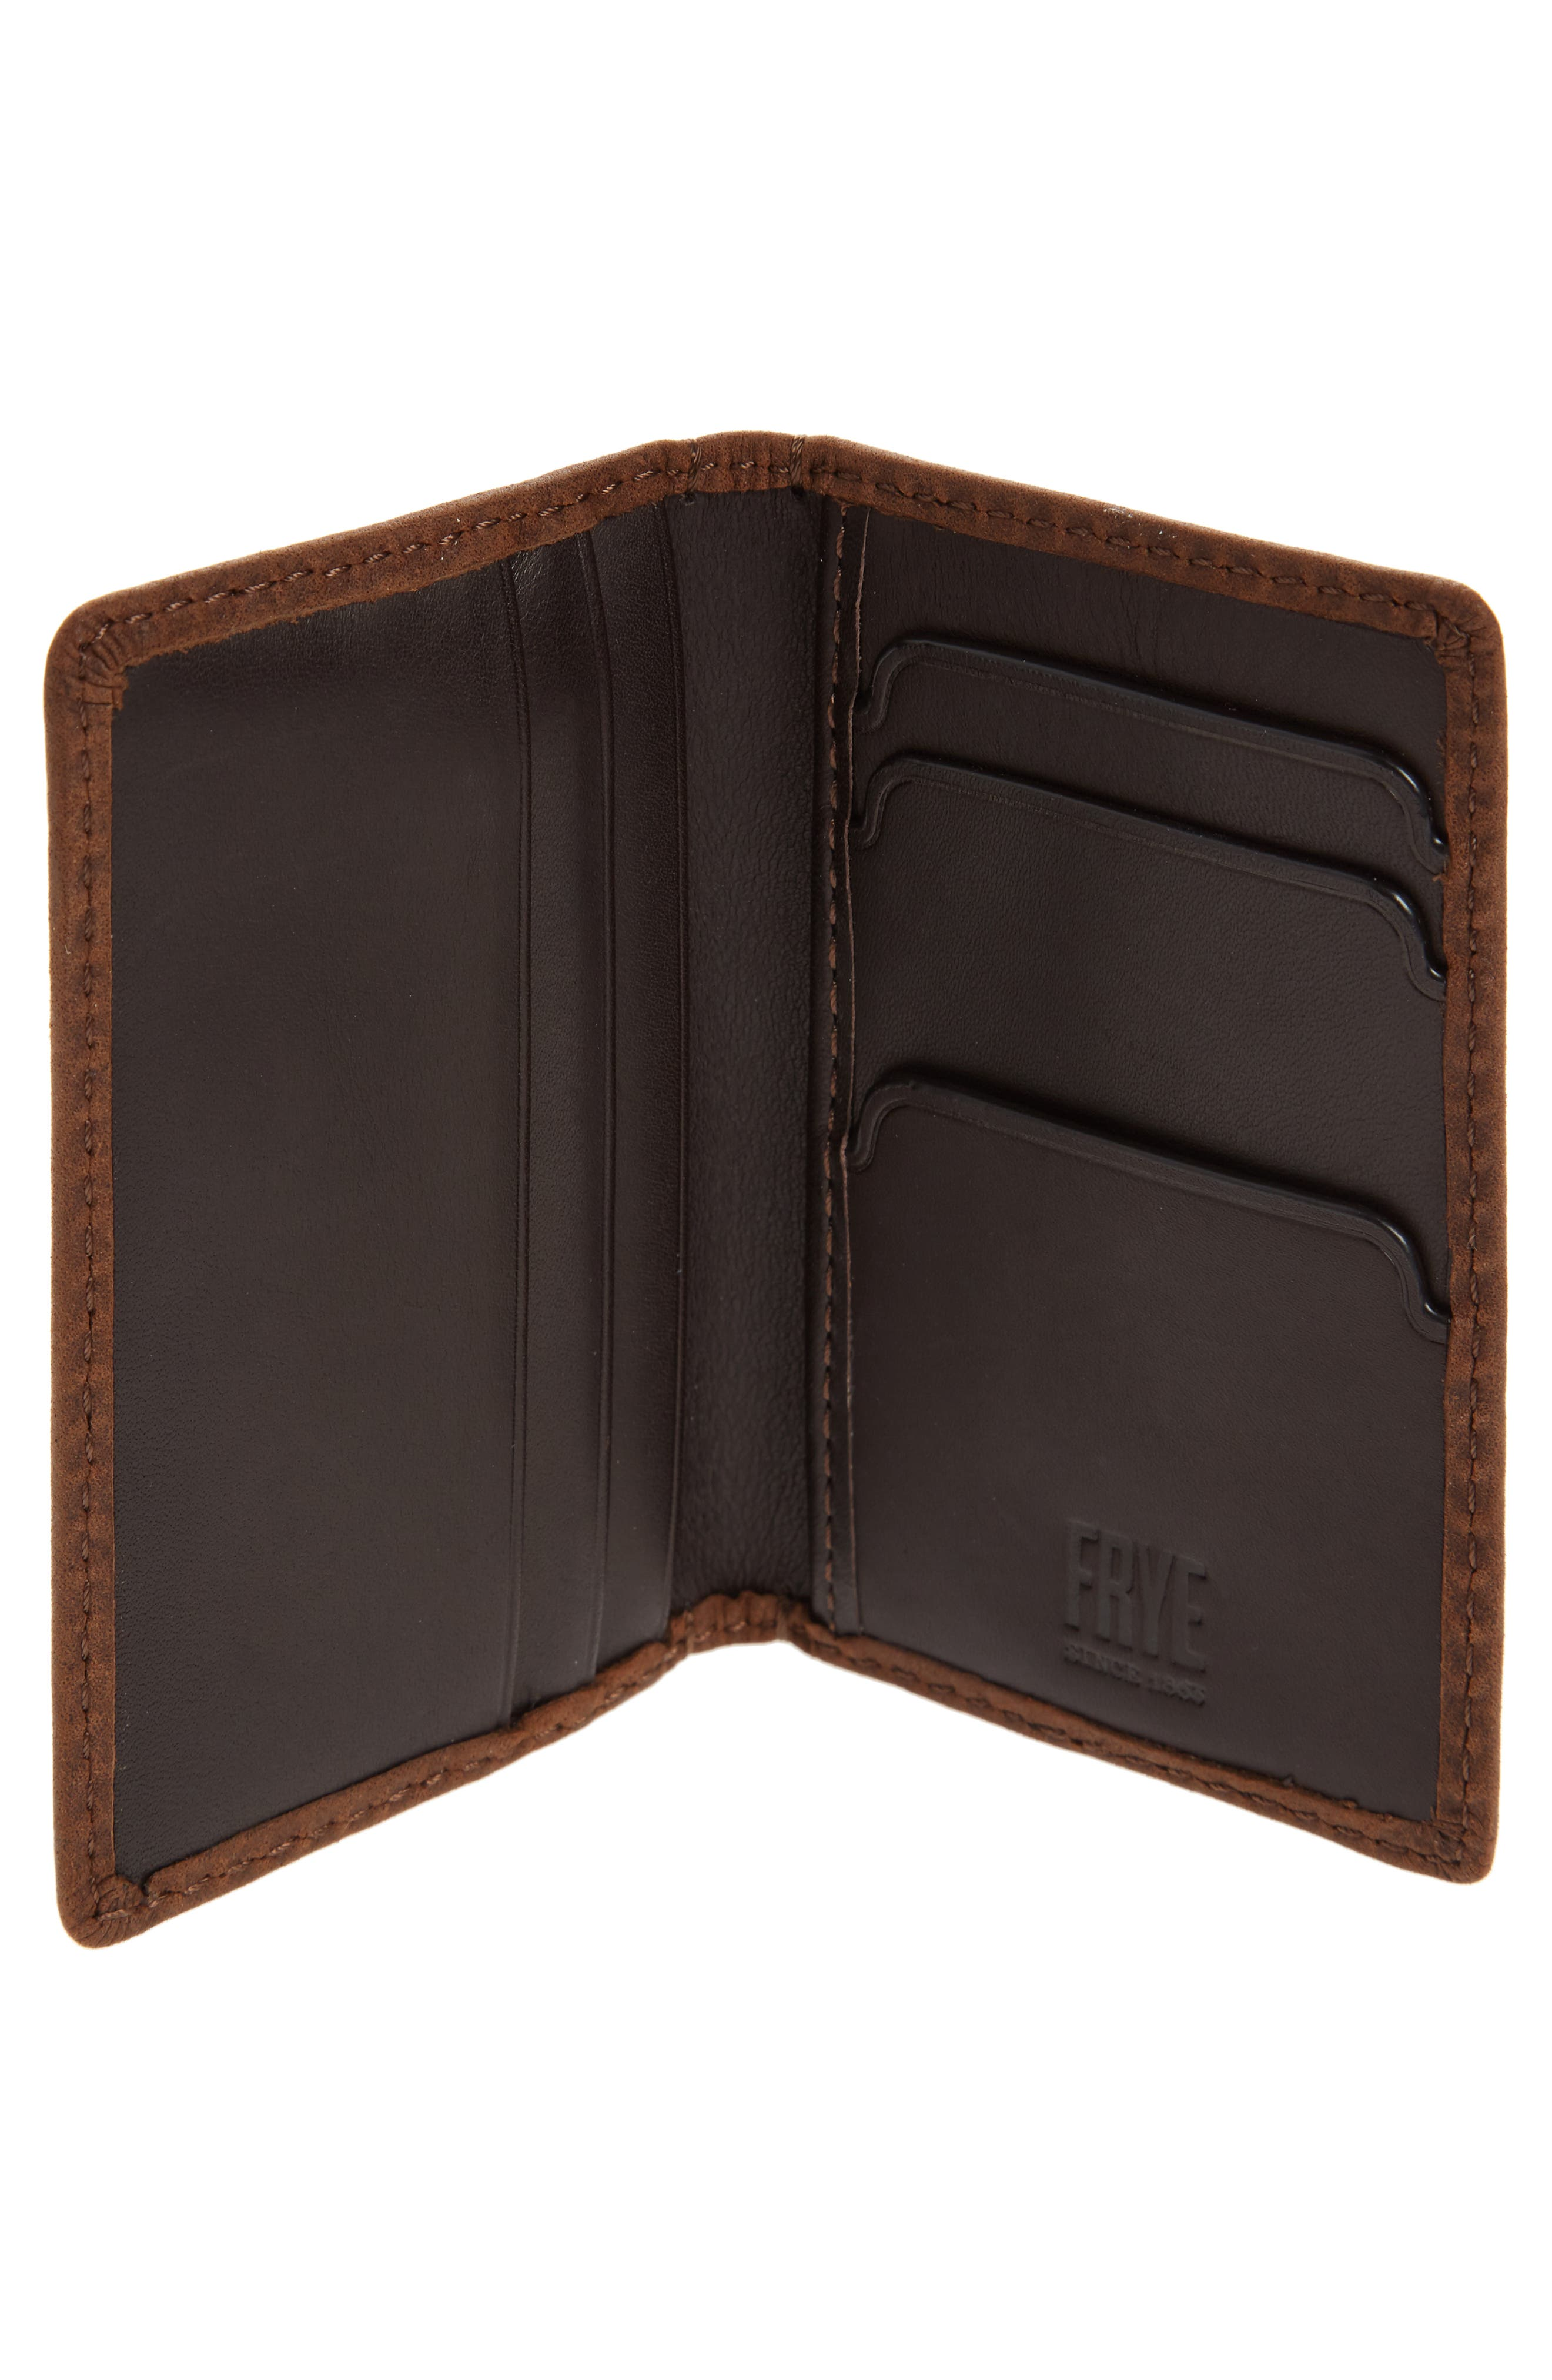 Oliver Leather Wallet,                             Alternate thumbnail 2, color,                             Dark Brown